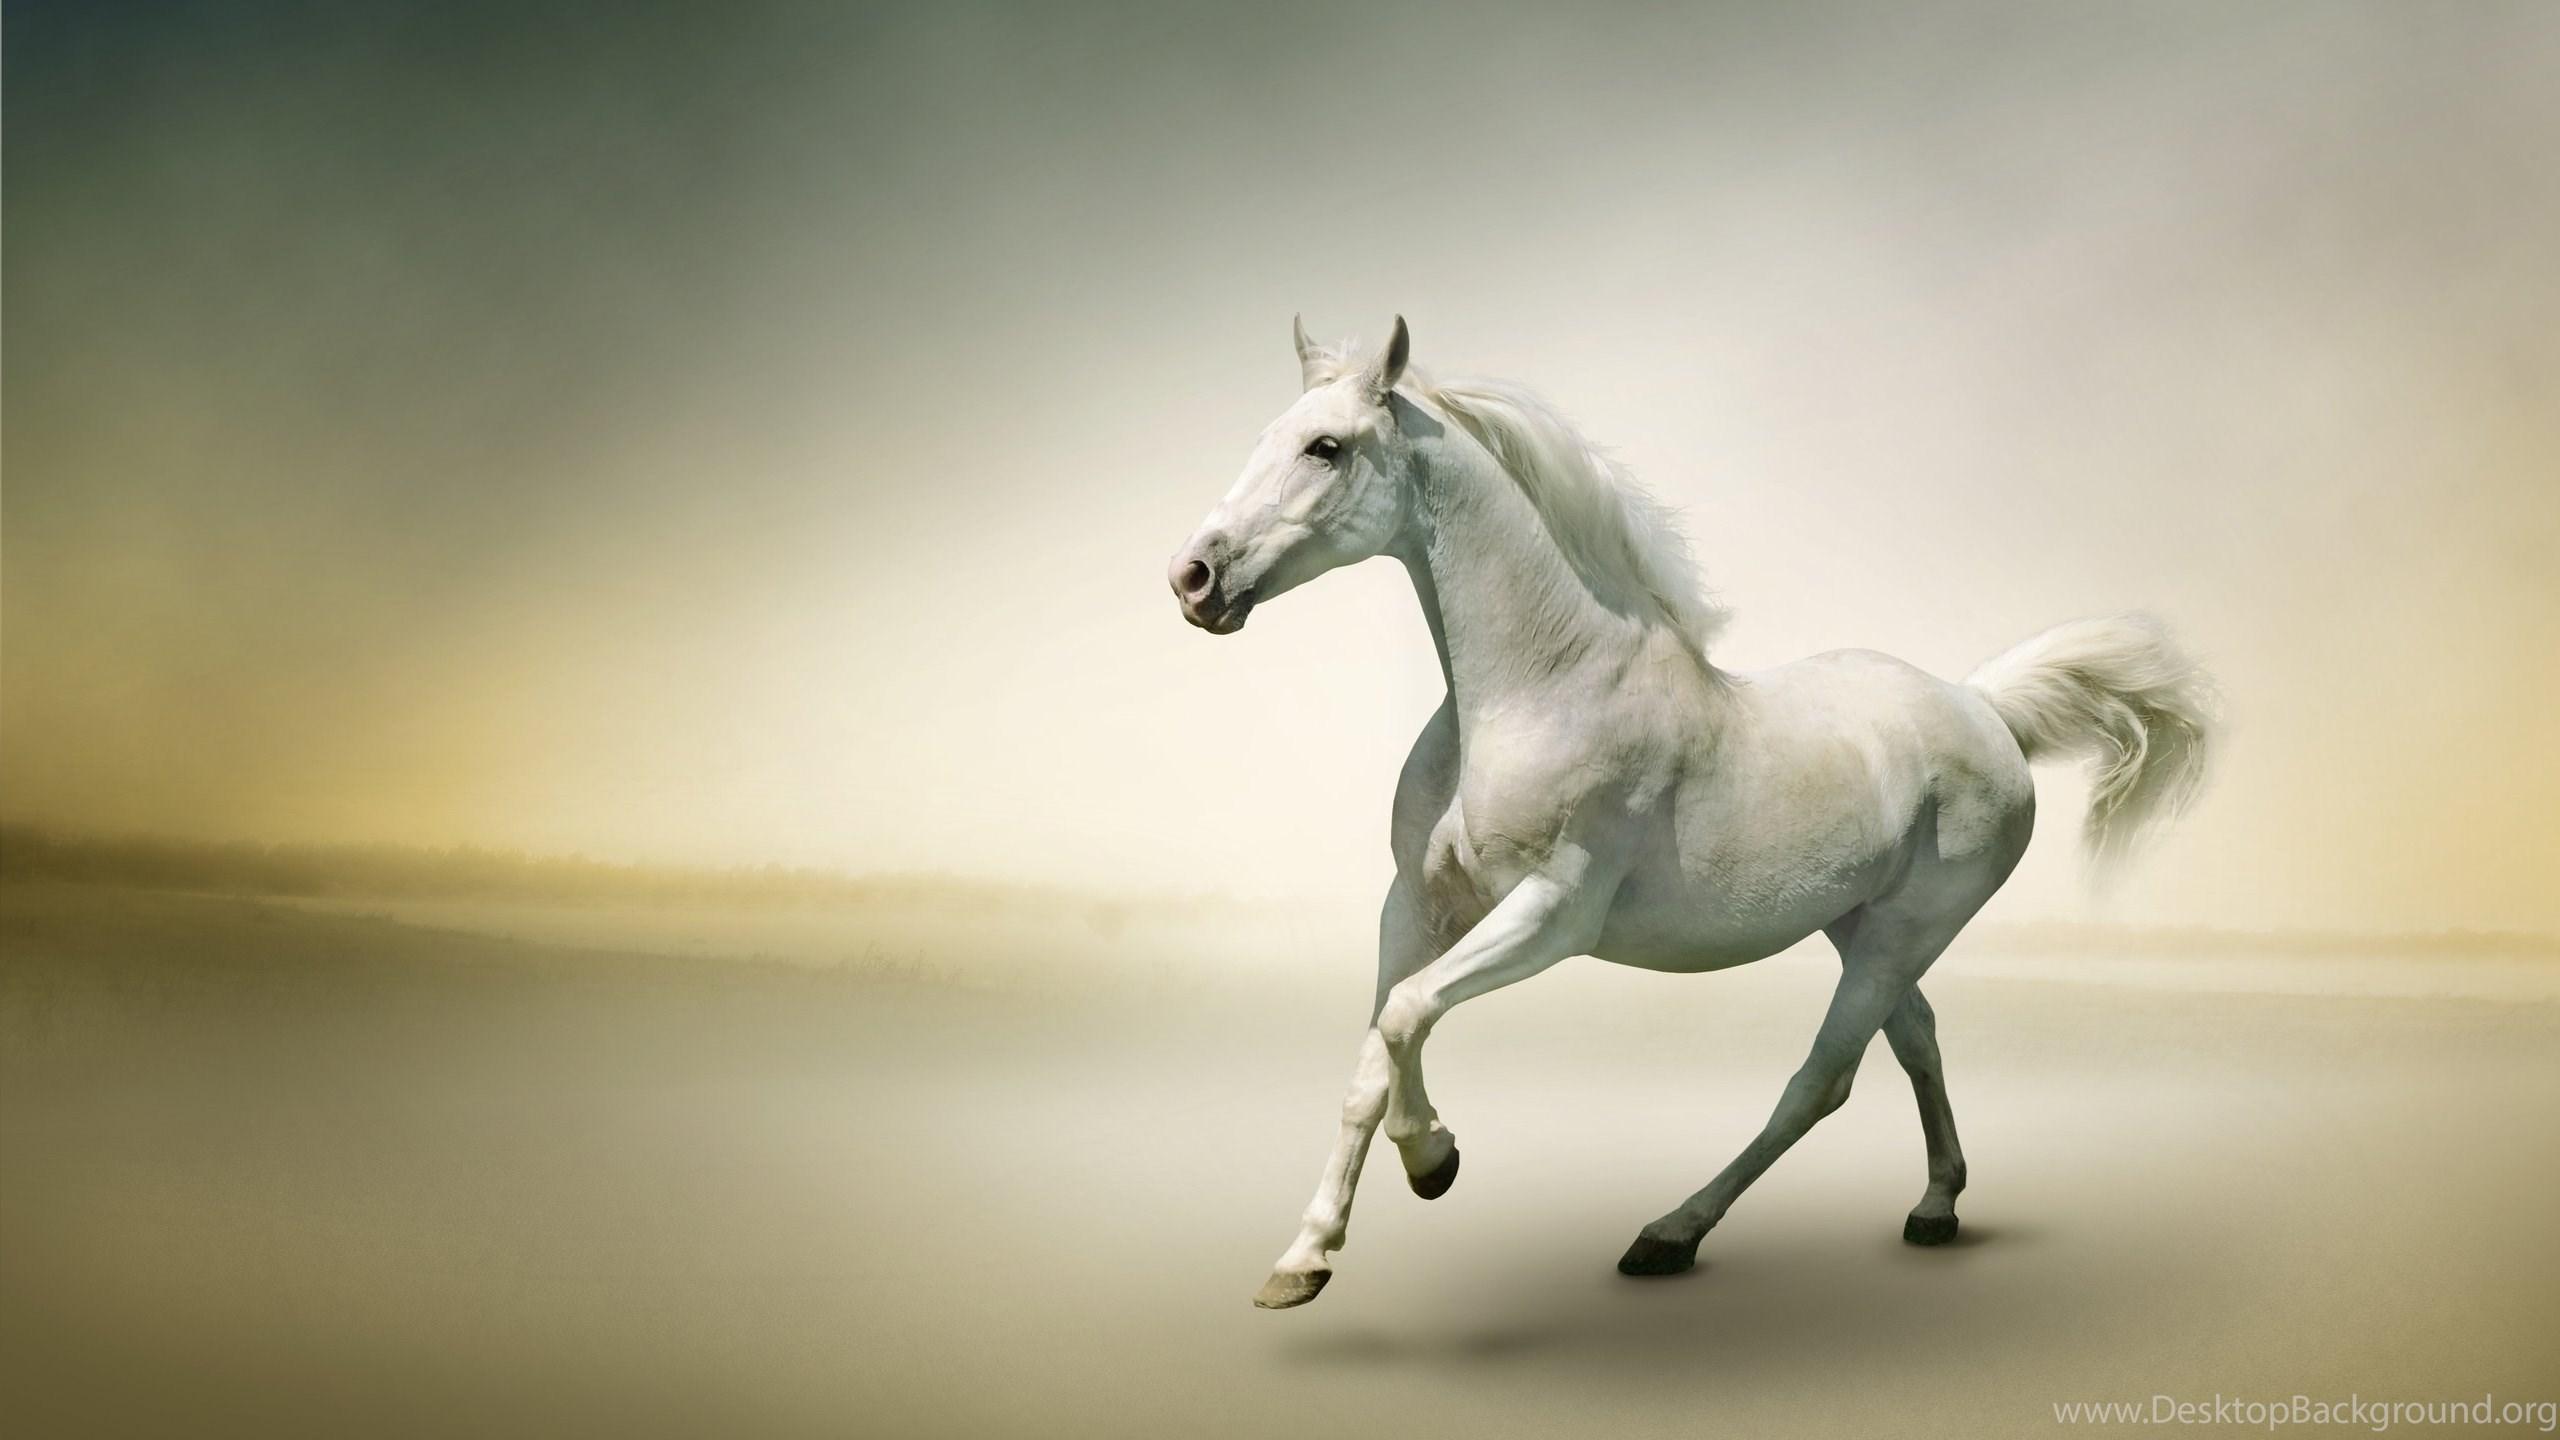 Free horses wallpapers hd toptenpack desktop background netbook voltagebd Image collections